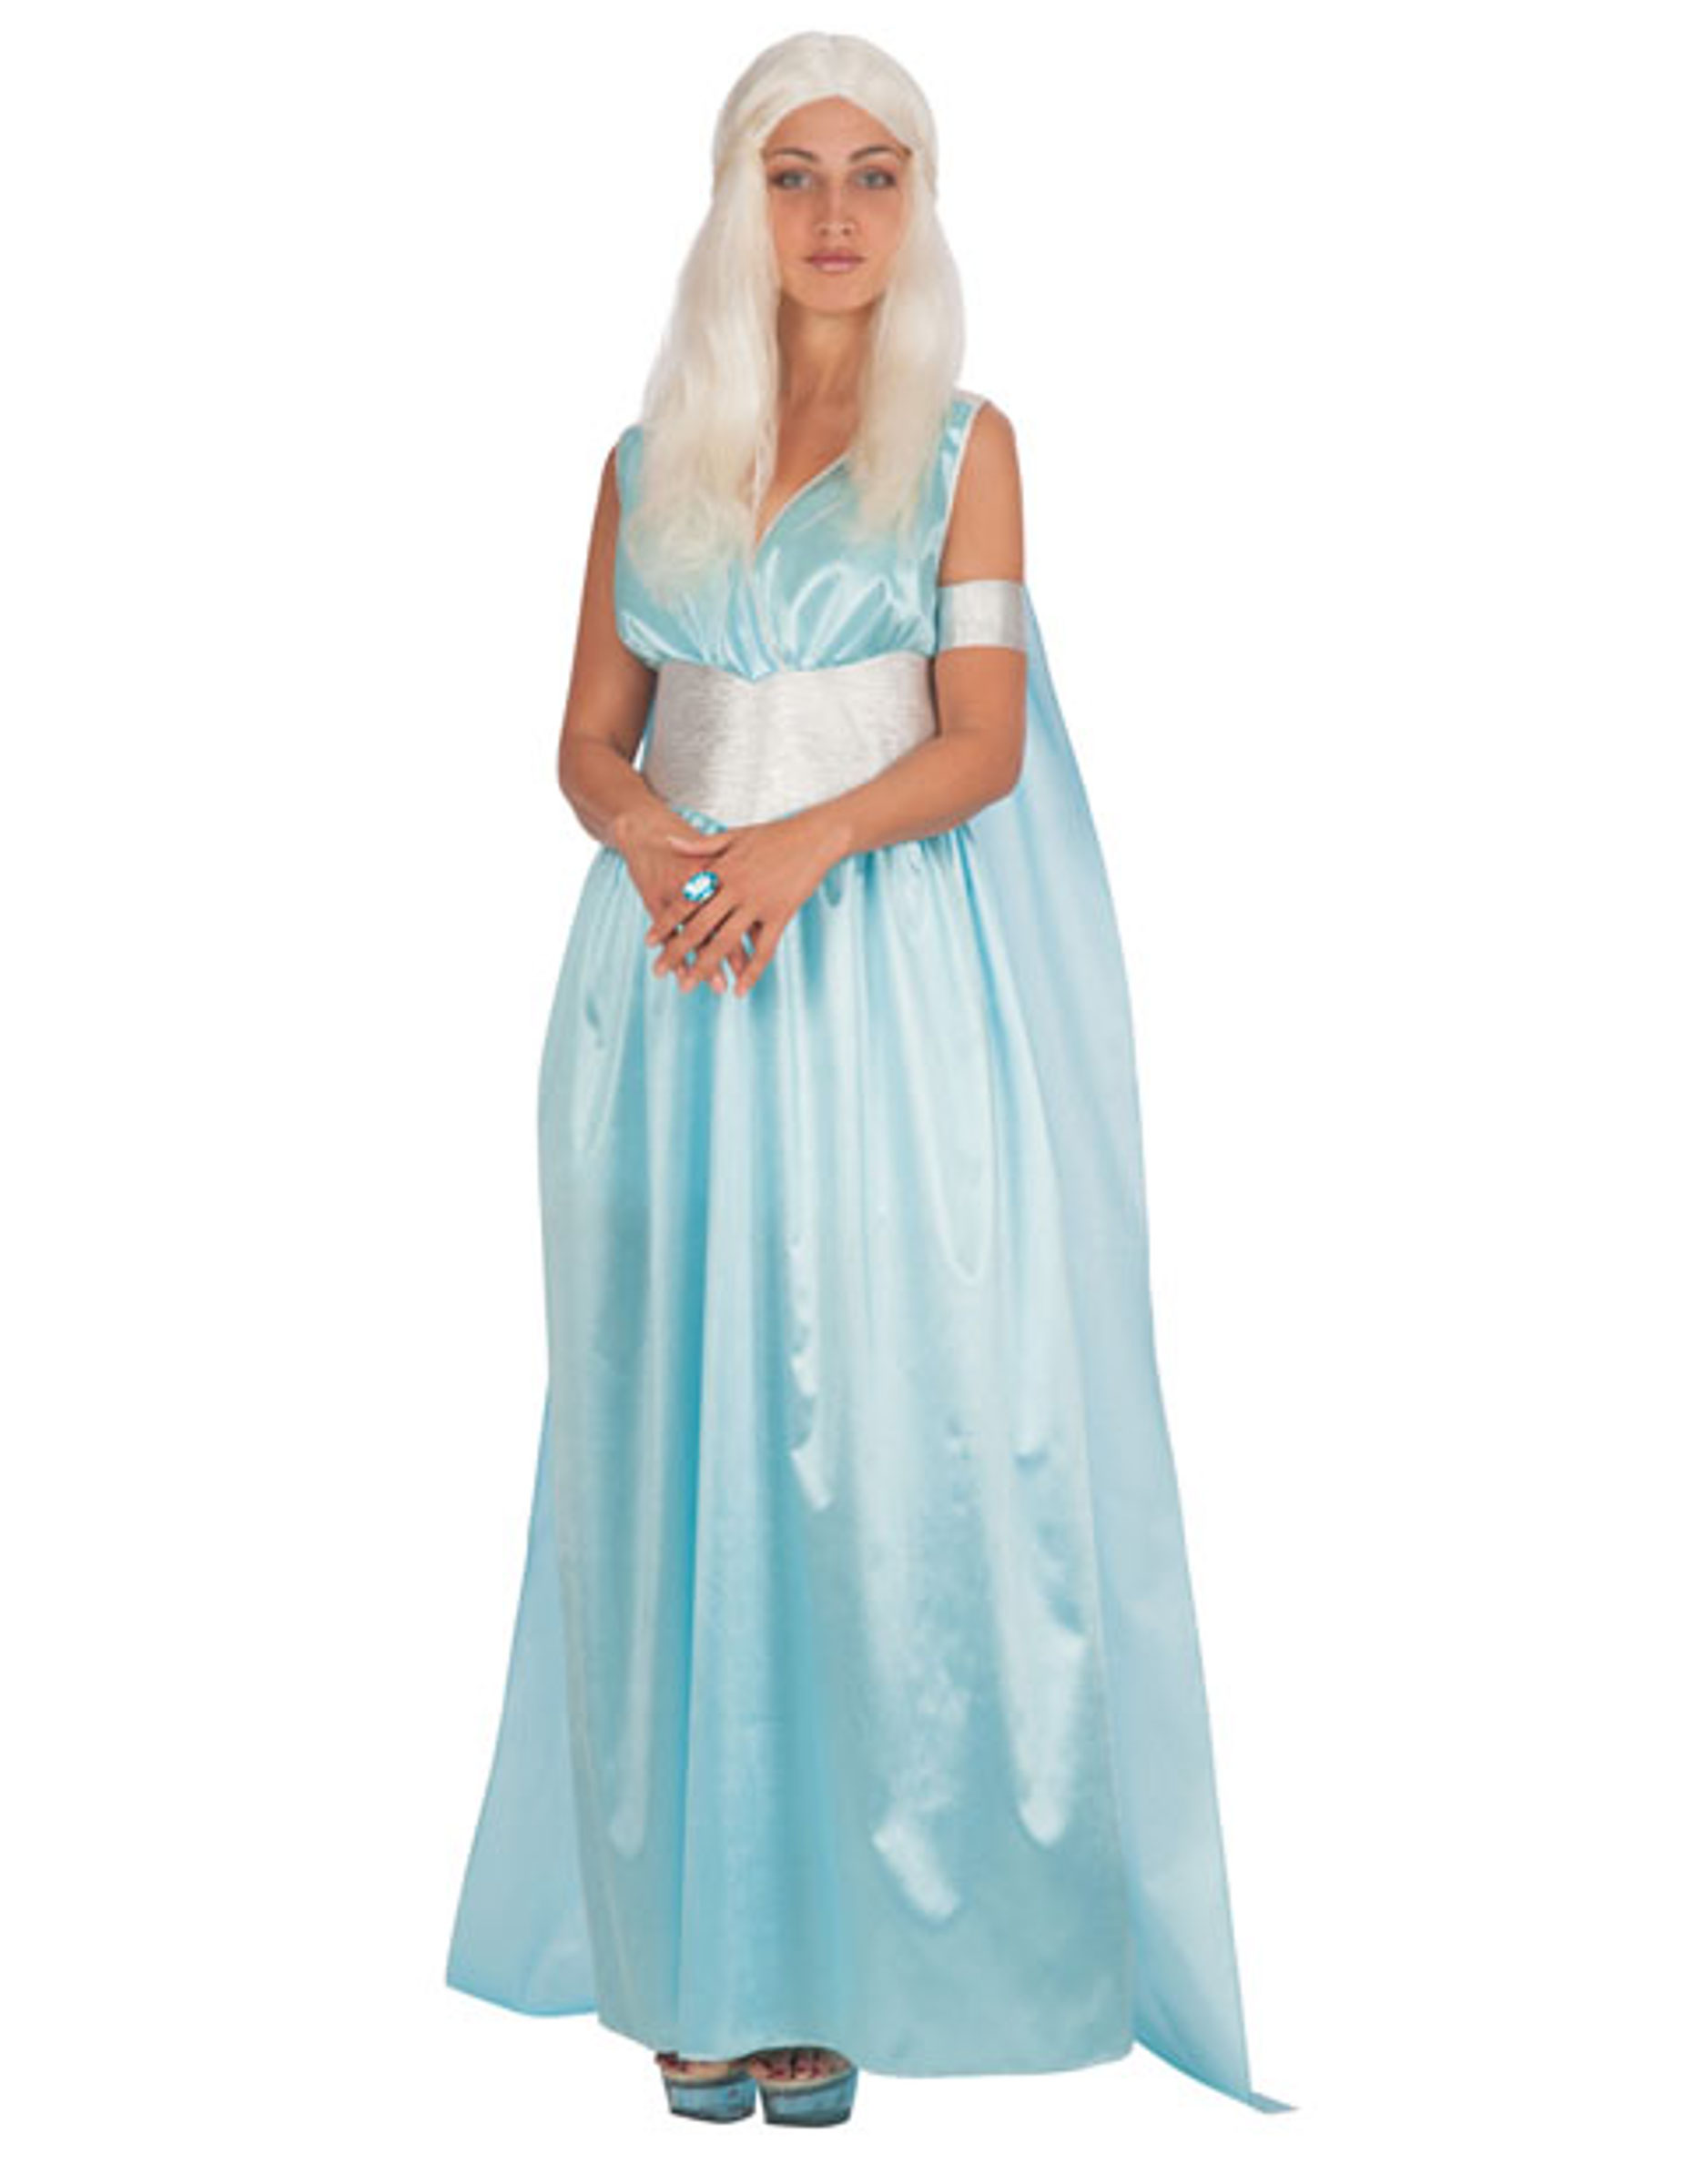 d guisement princesse des dragons bleu femme deguise toi. Black Bedroom Furniture Sets. Home Design Ideas